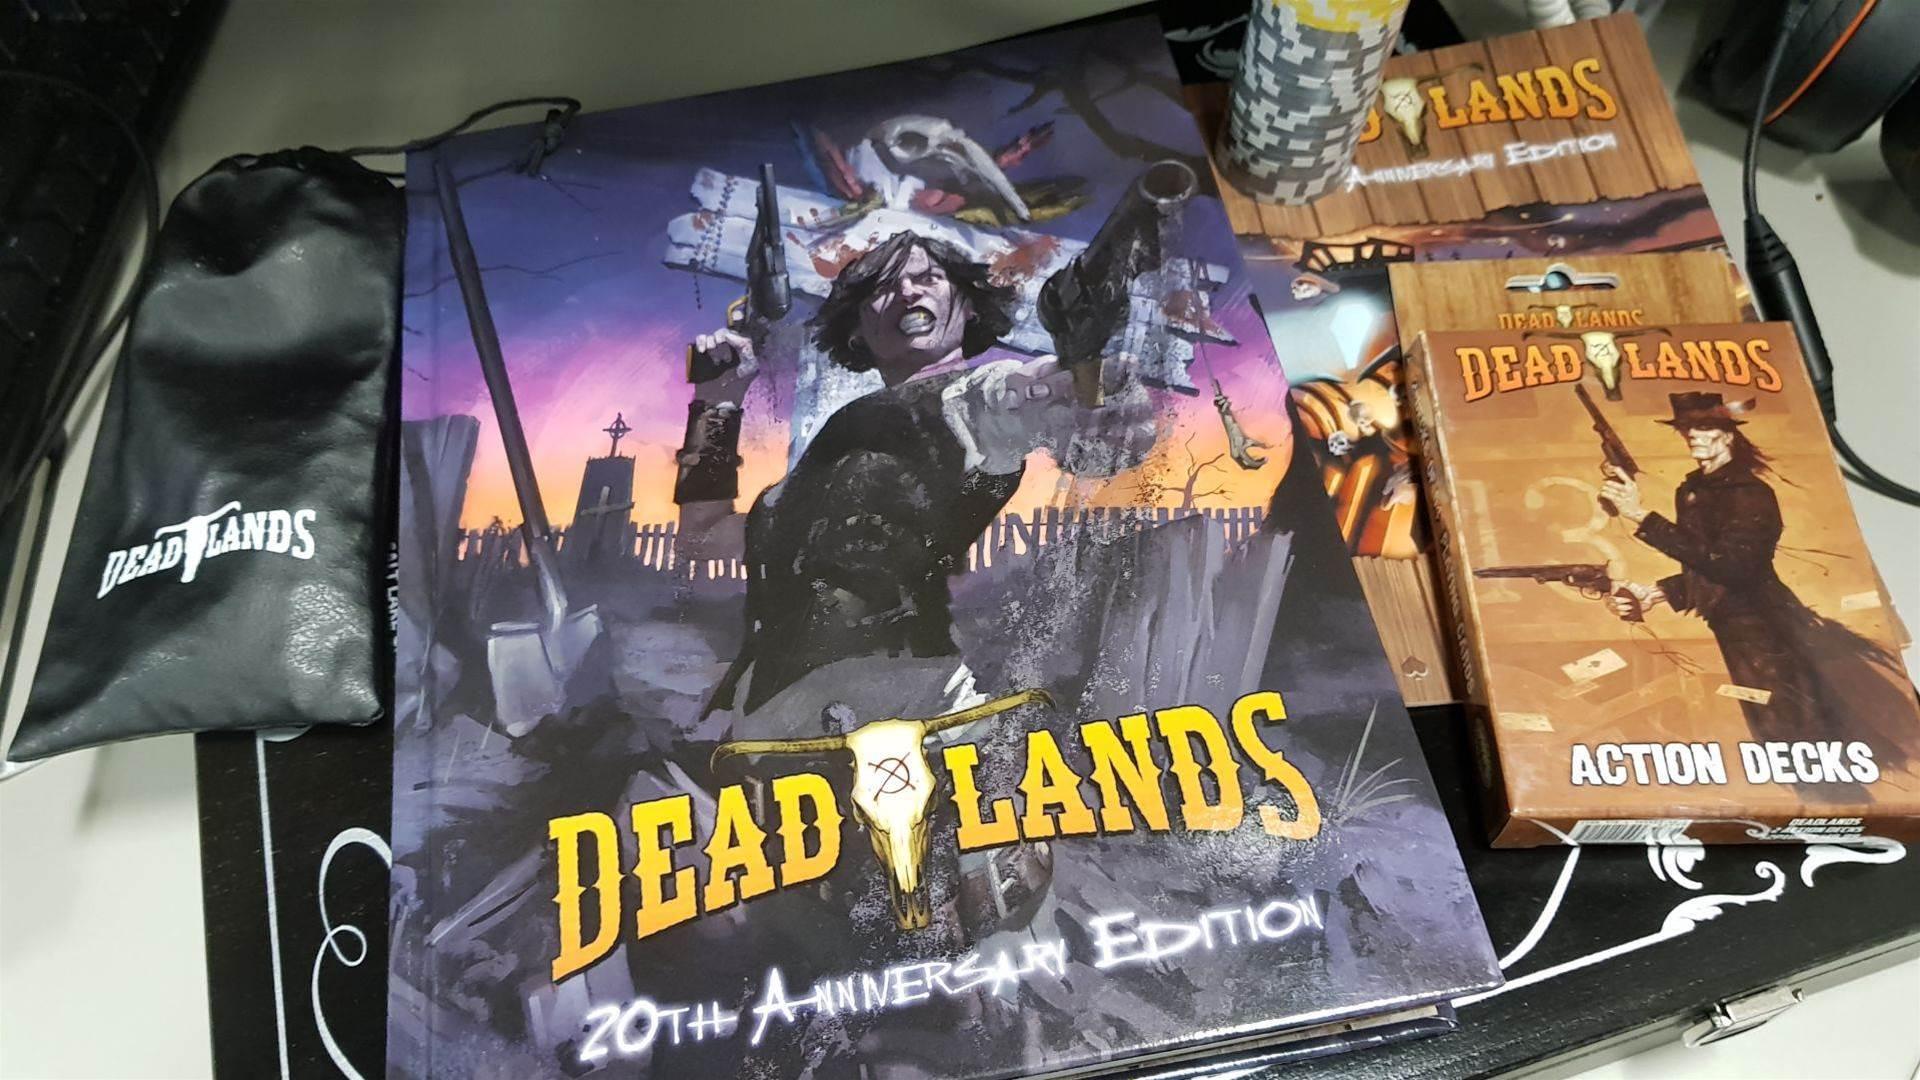 The Deadlands 20th Anniversary kickstarter package is pretty damn neat